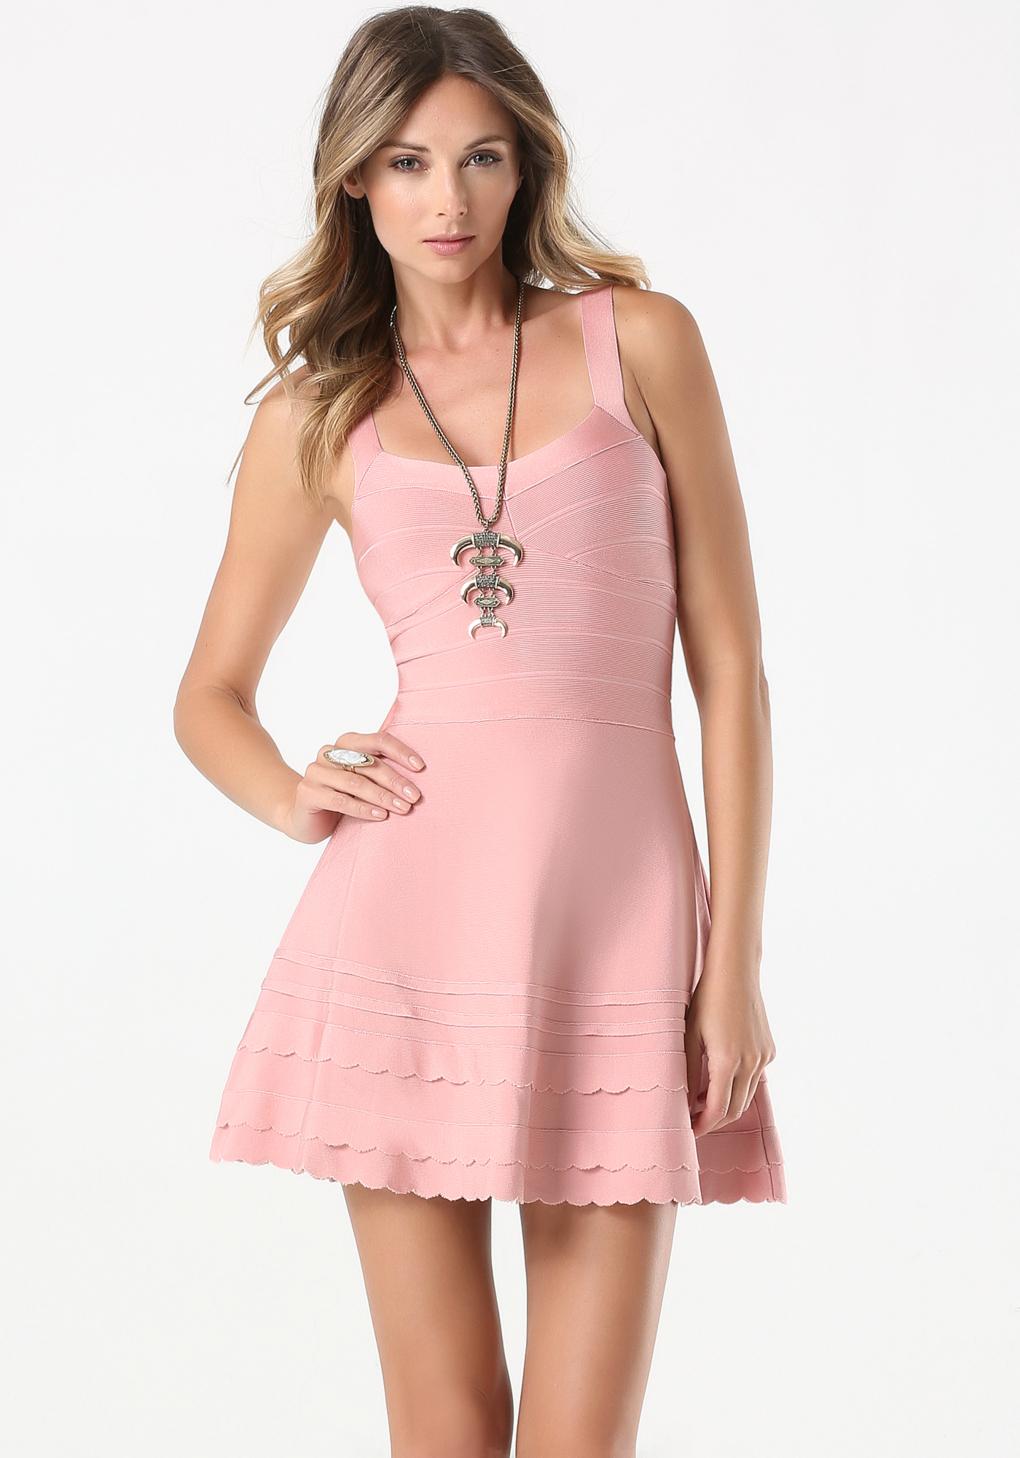 Bebe Pink Flared Bandage Dress Lyst